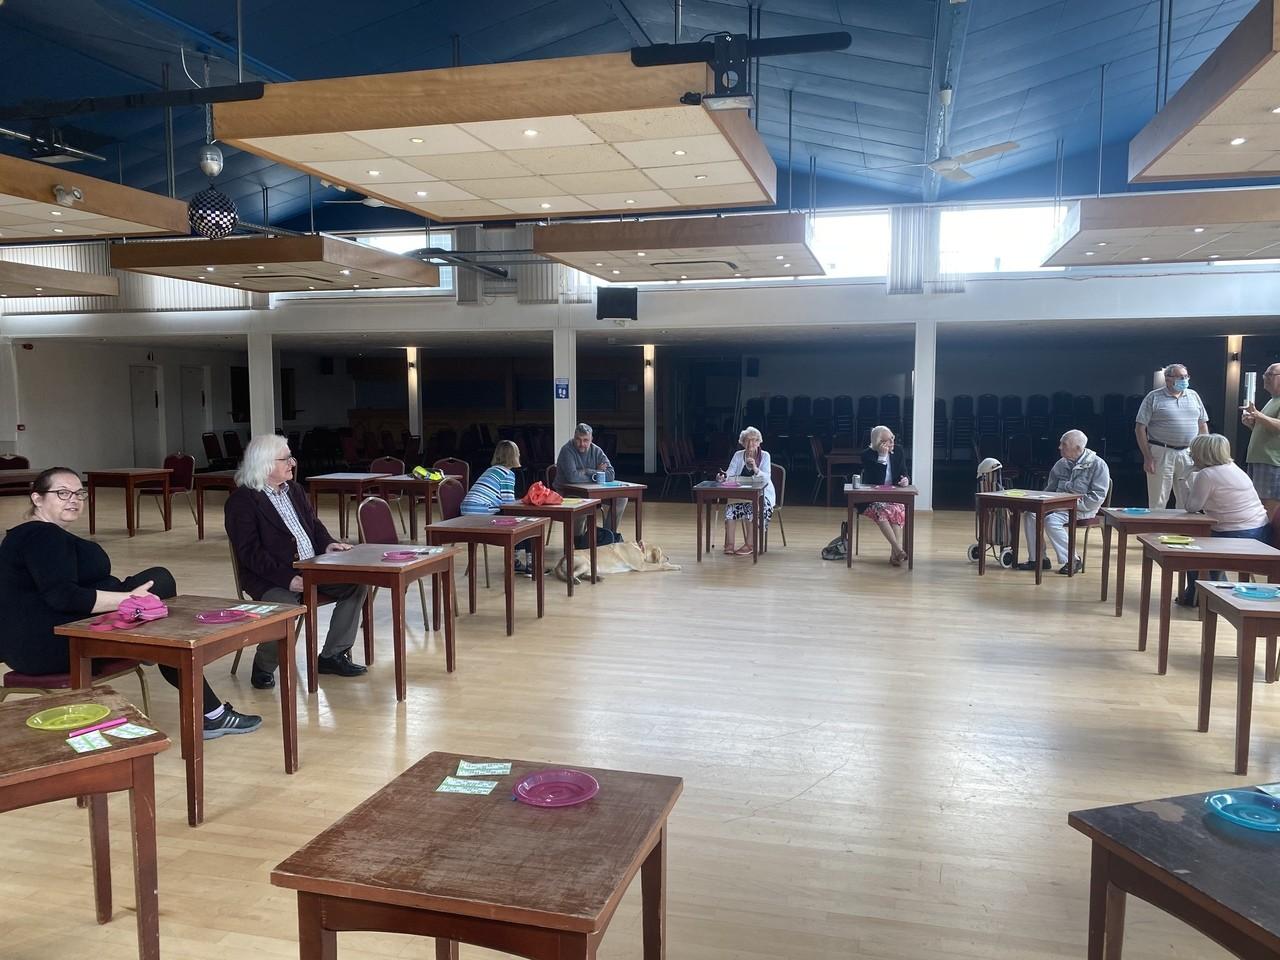 Community centre back open | Asda Gosport